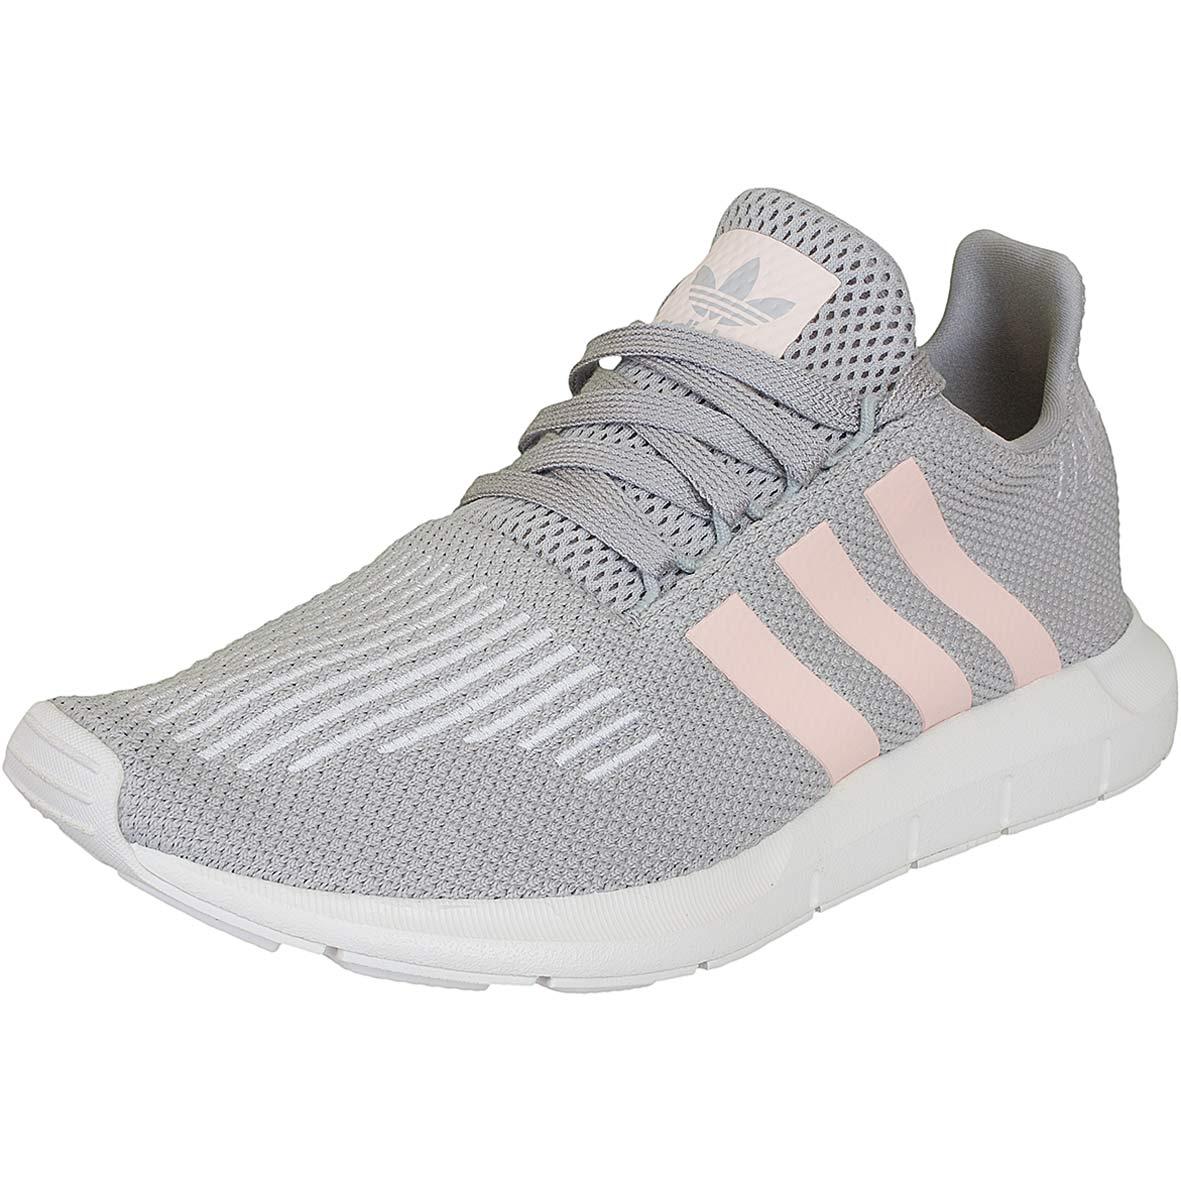 adidas originals damen sneaker swift run grau pink hier bestellen. Black Bedroom Furniture Sets. Home Design Ideas